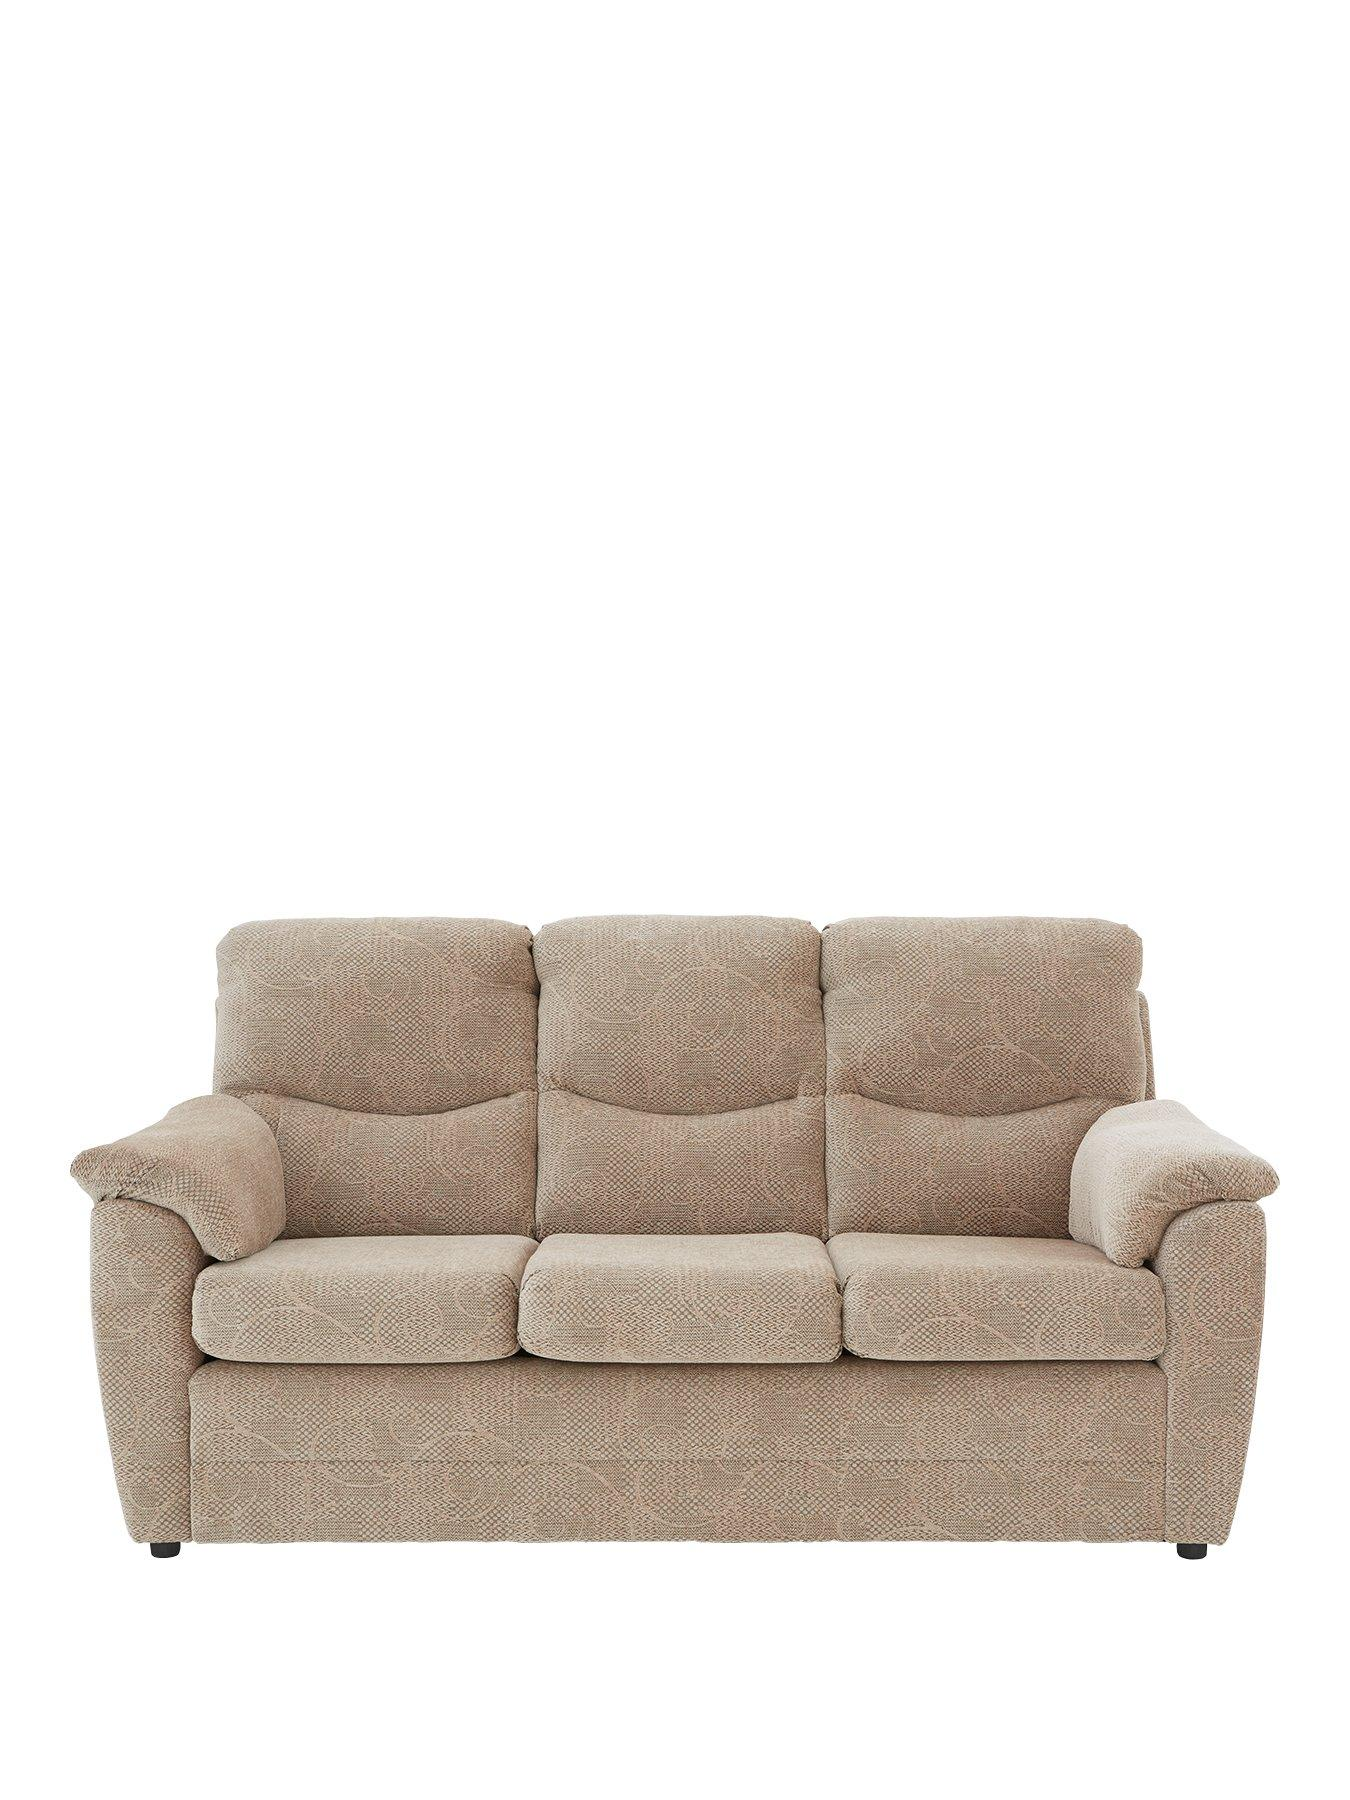 dalton sofa bed best brands usa 3 seater fabric littlewoods com